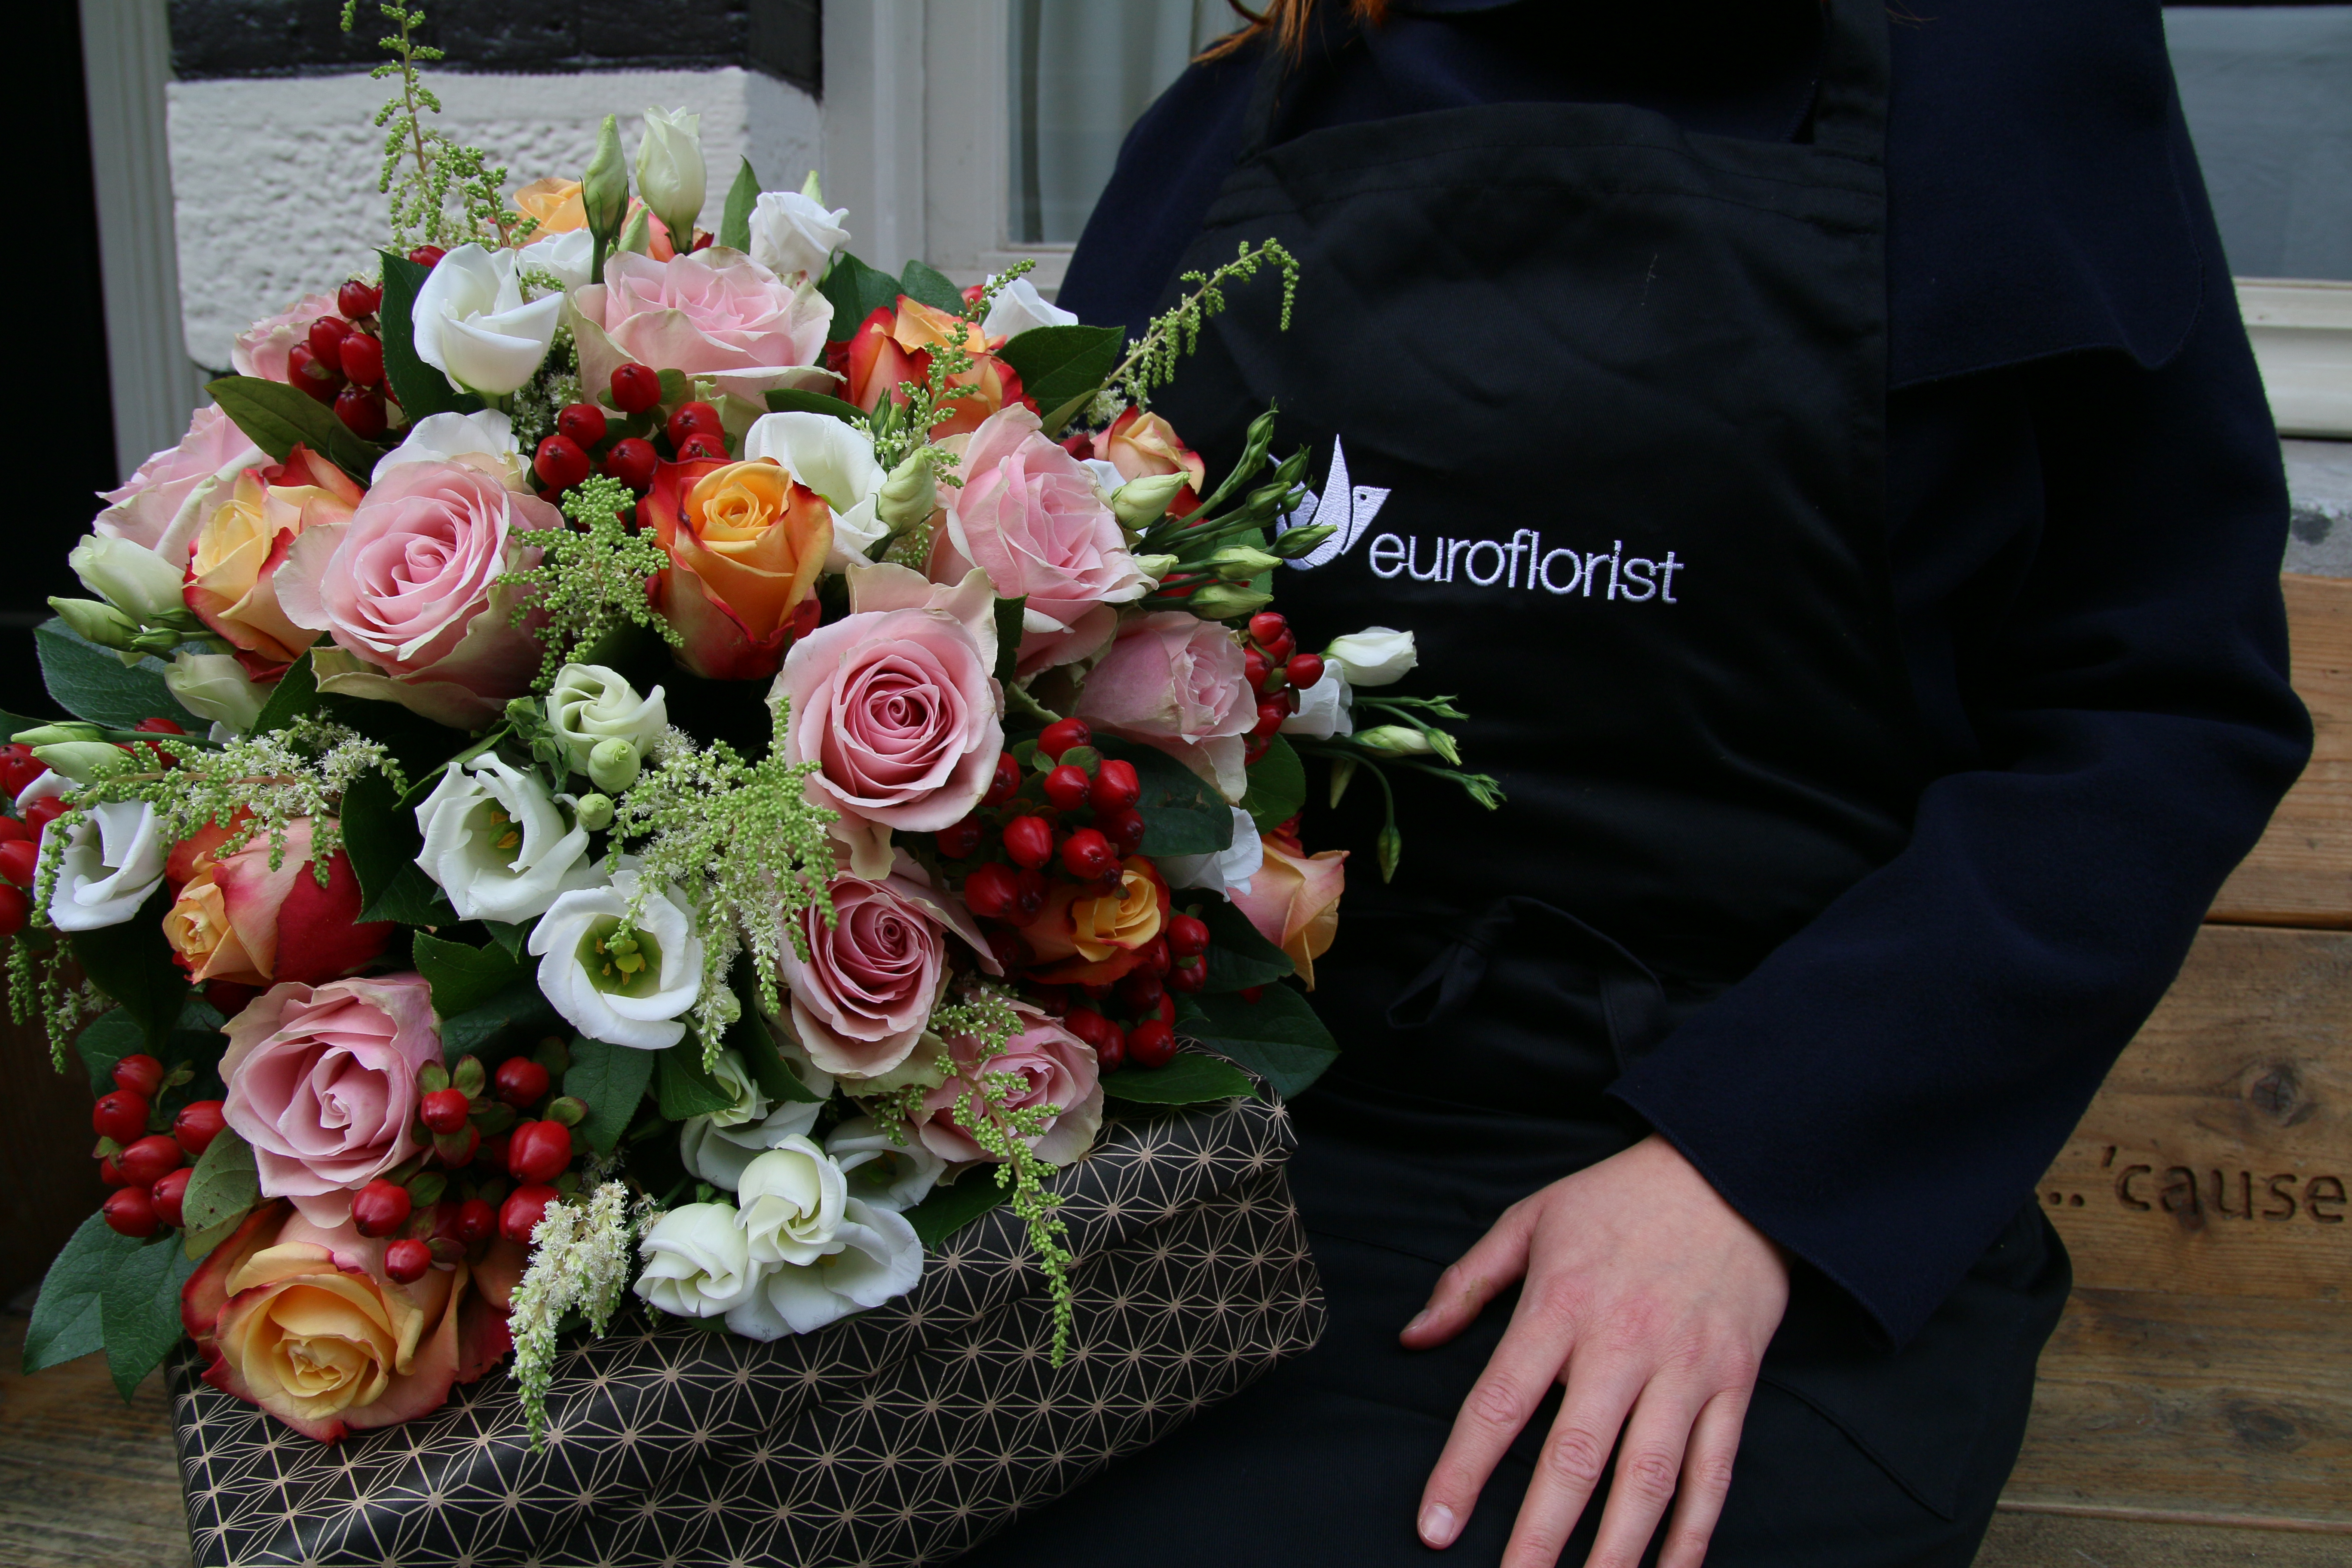 Group Financial Controller till Euroflorist i Malmö